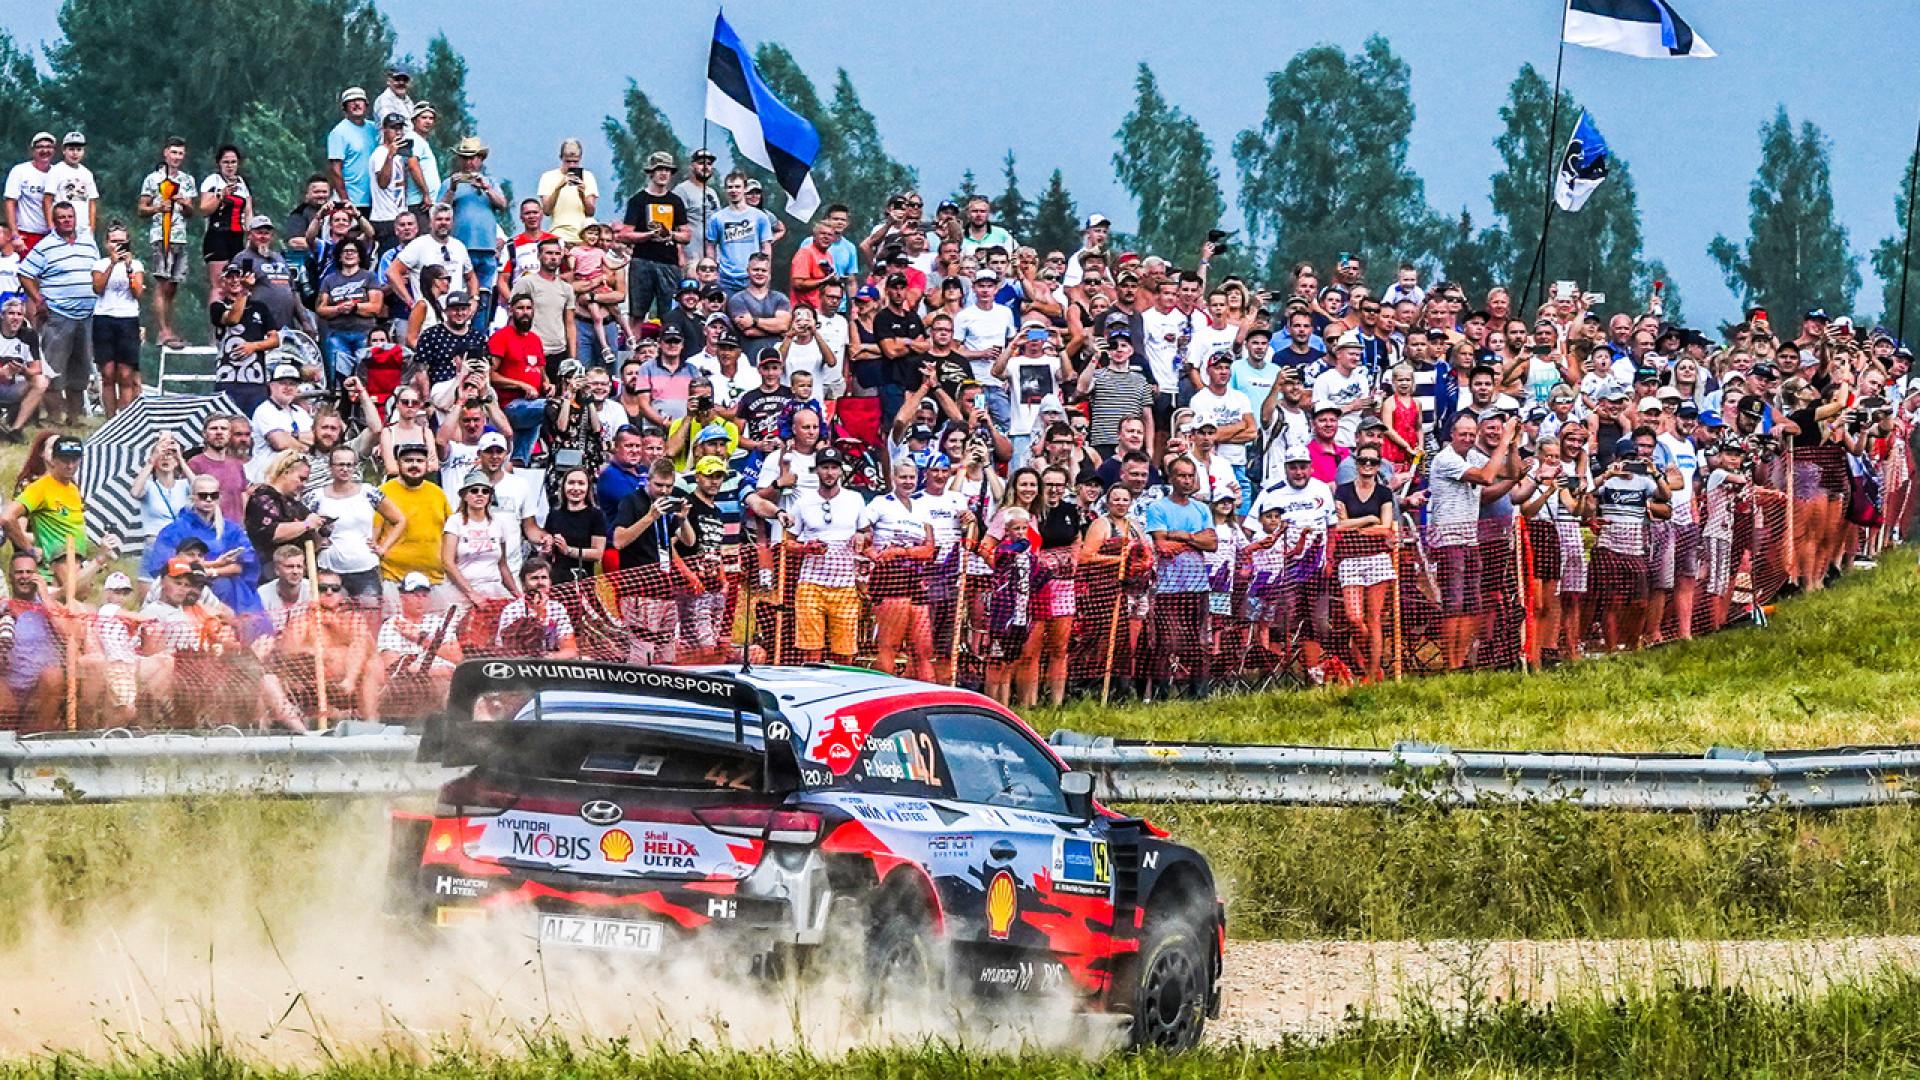 WRC: 11º Rally Estonia [15-18 Julio] - Página 3 160721_AT-CraigBreen-Estonia-2021_01